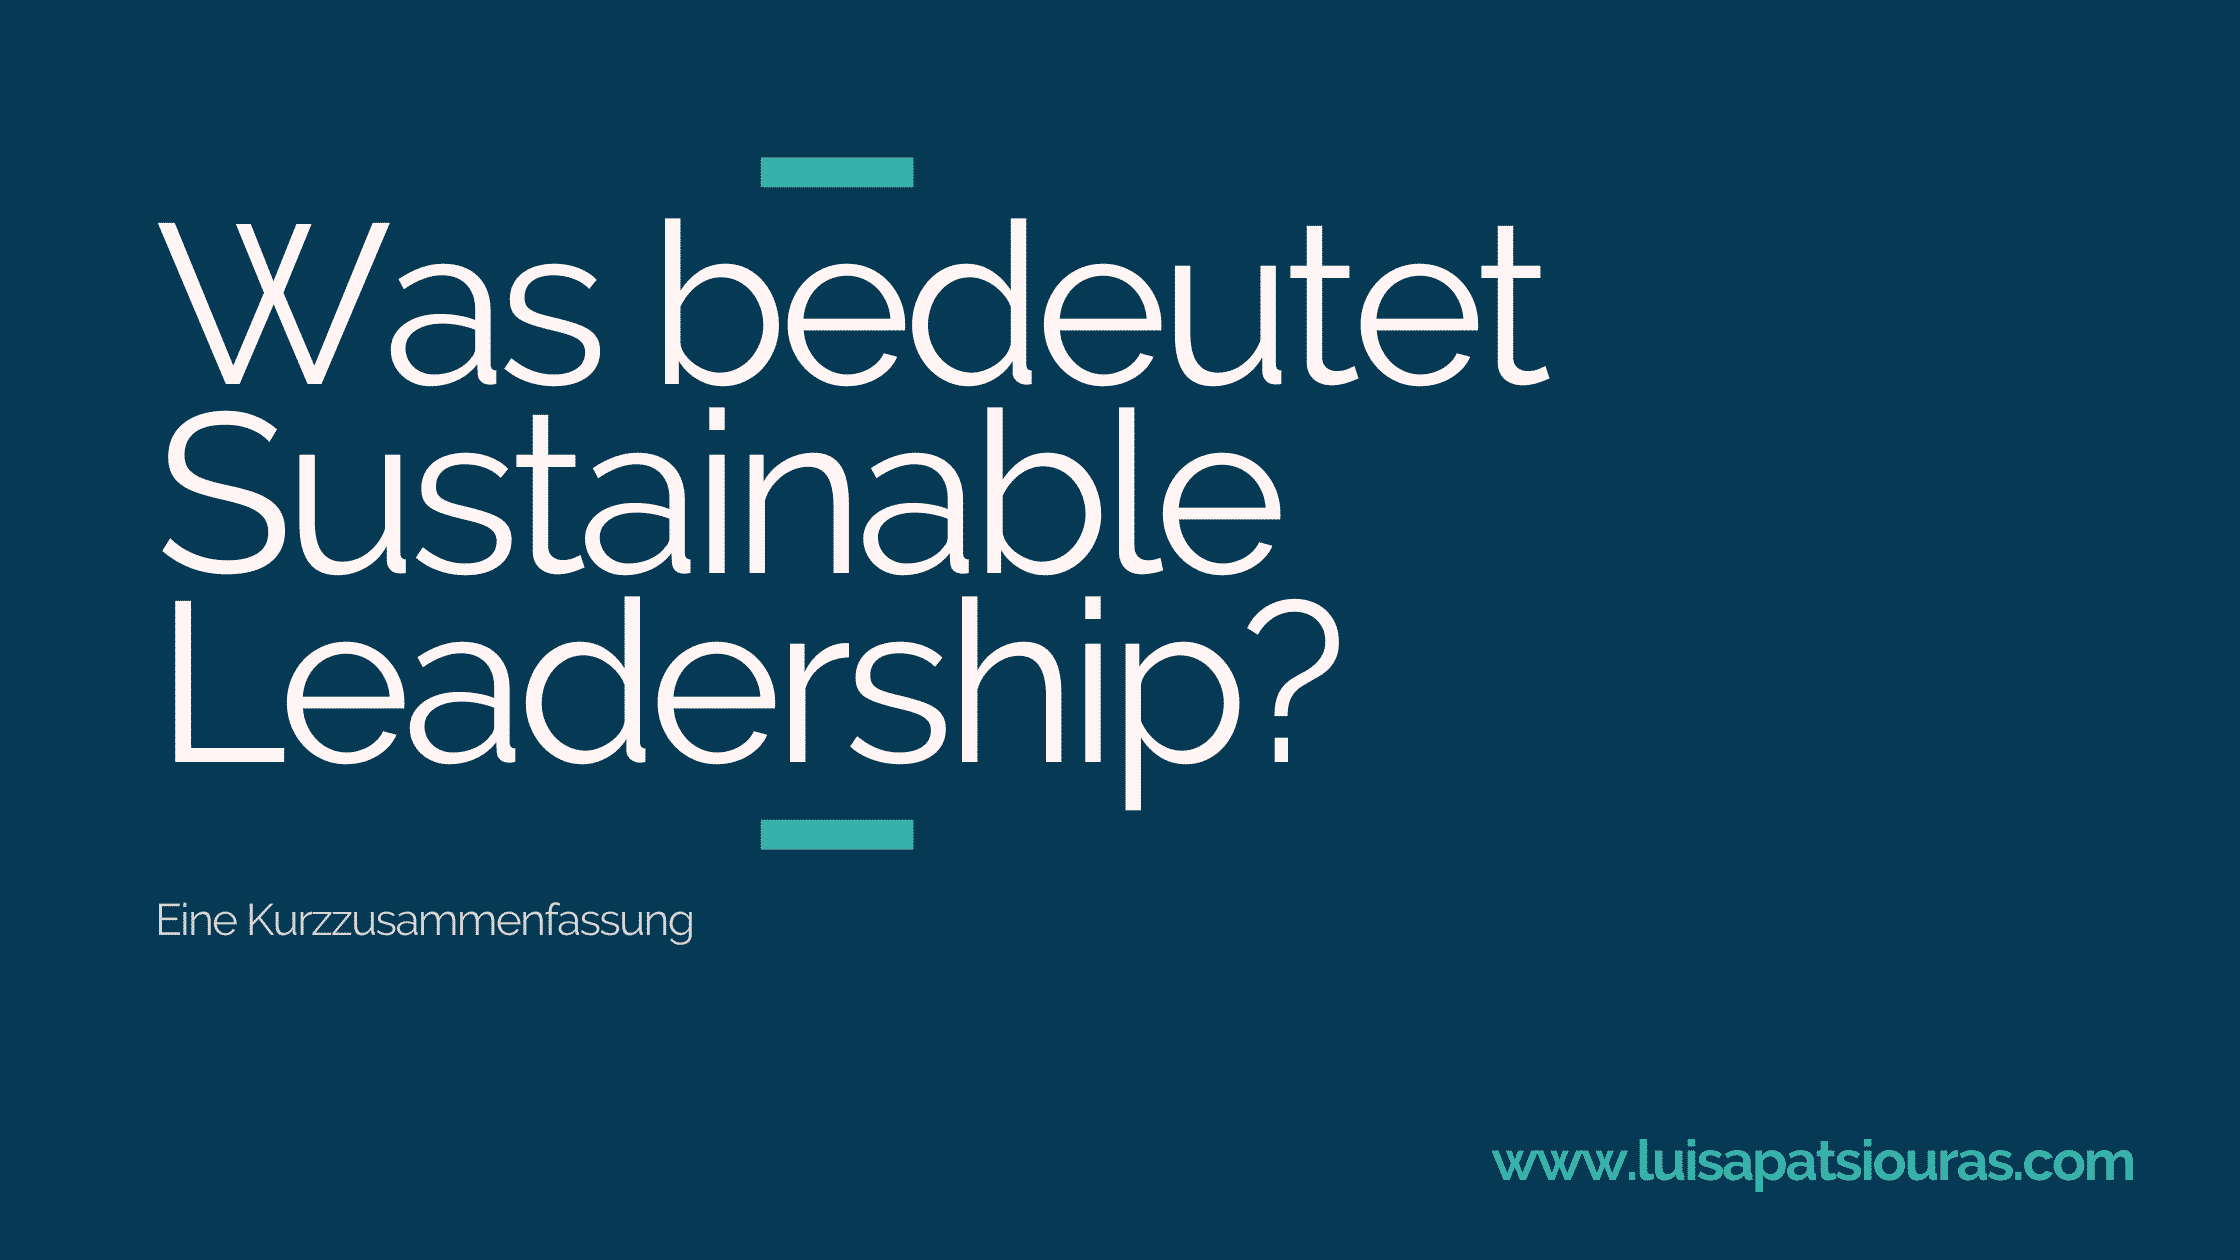 Was bedeutet Sustainable Leadership?